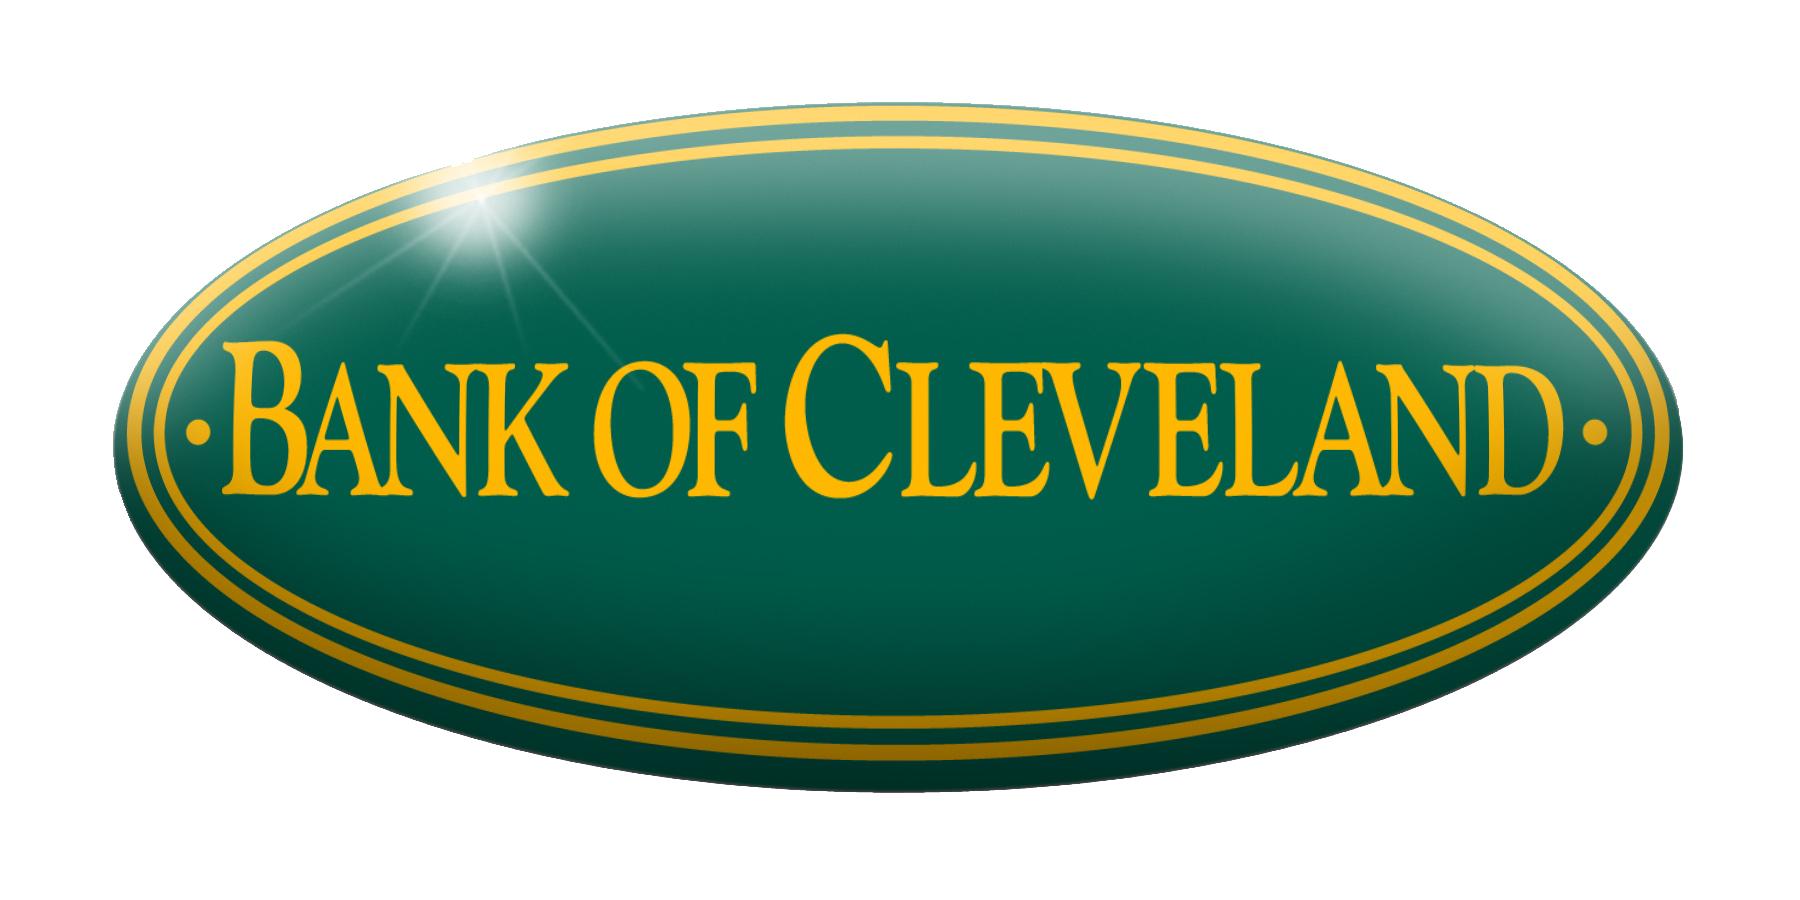 Bank of Cleveland.jpg